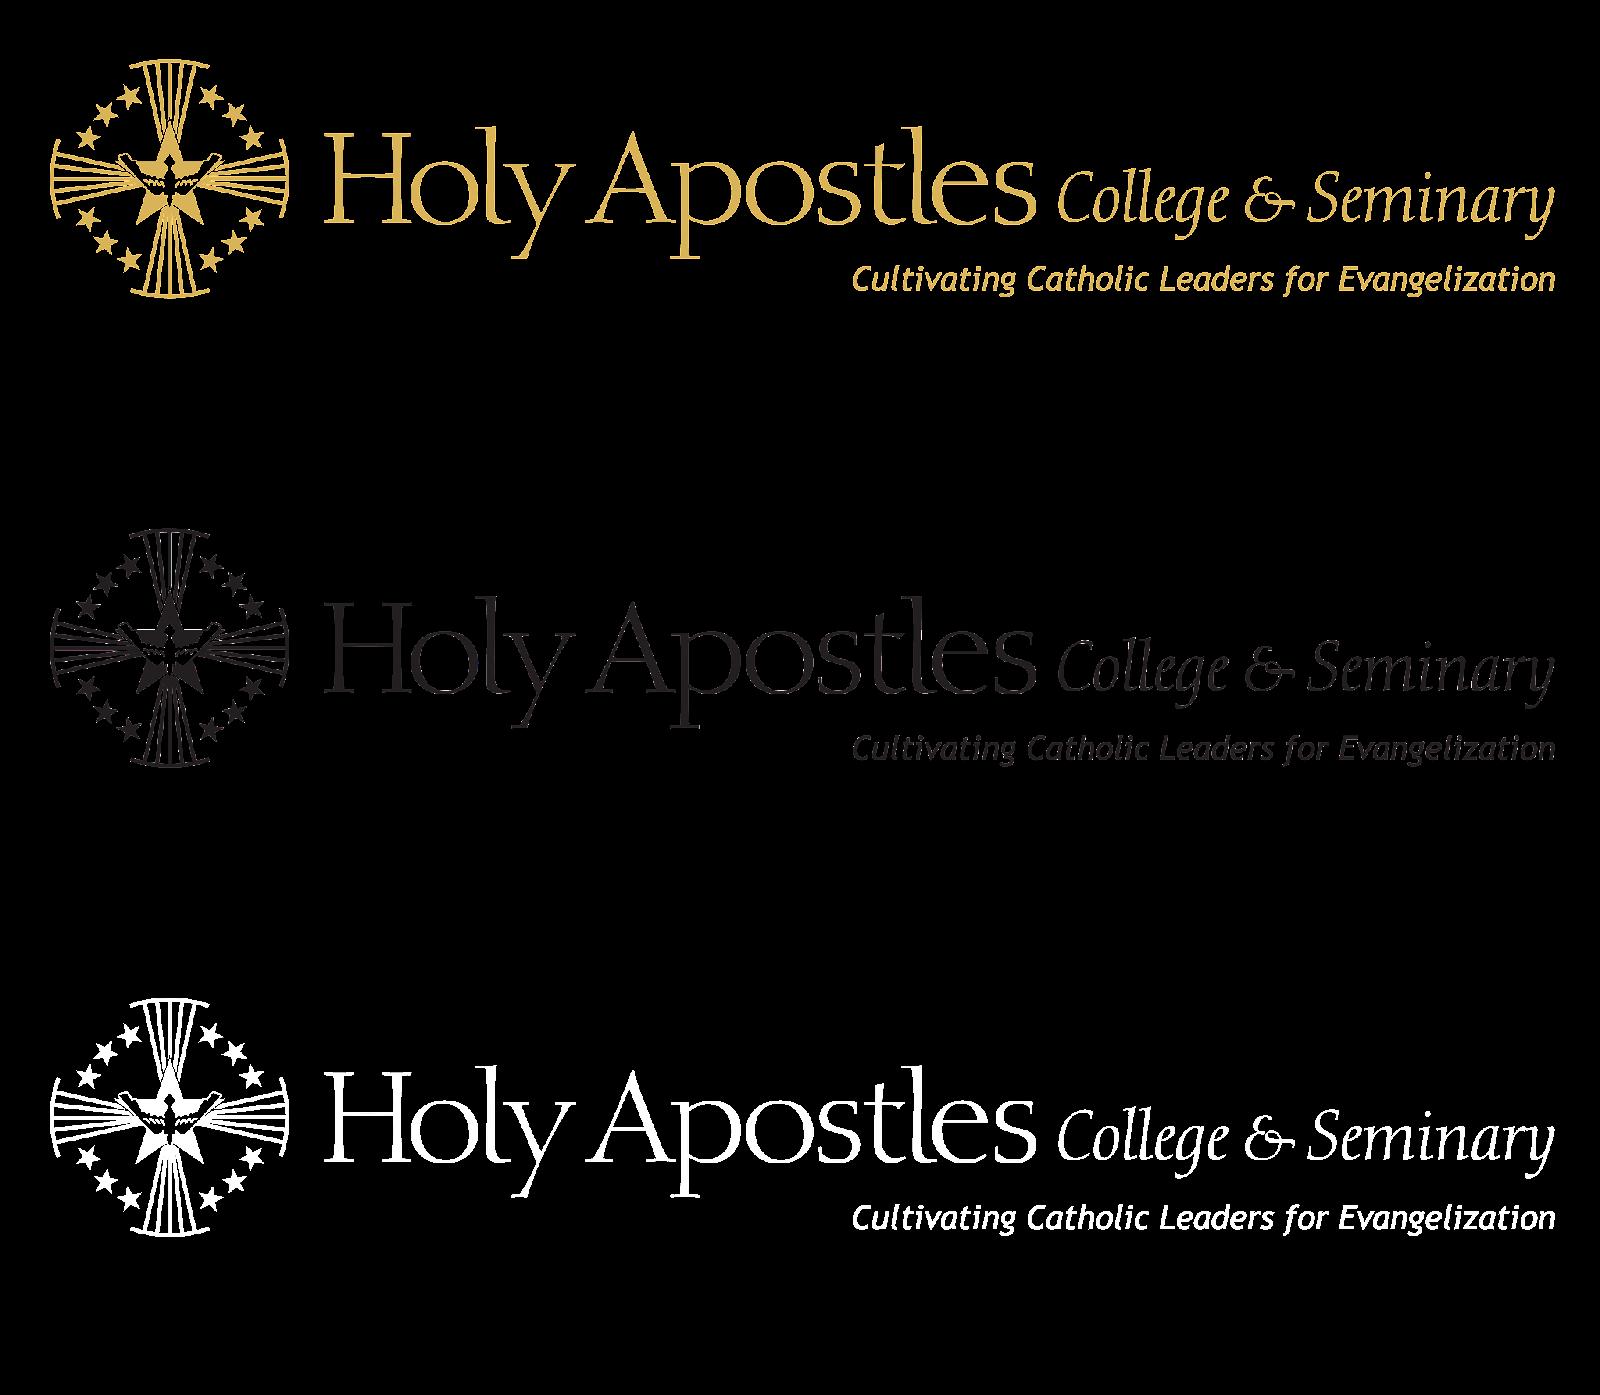 HACS-logo-master-small